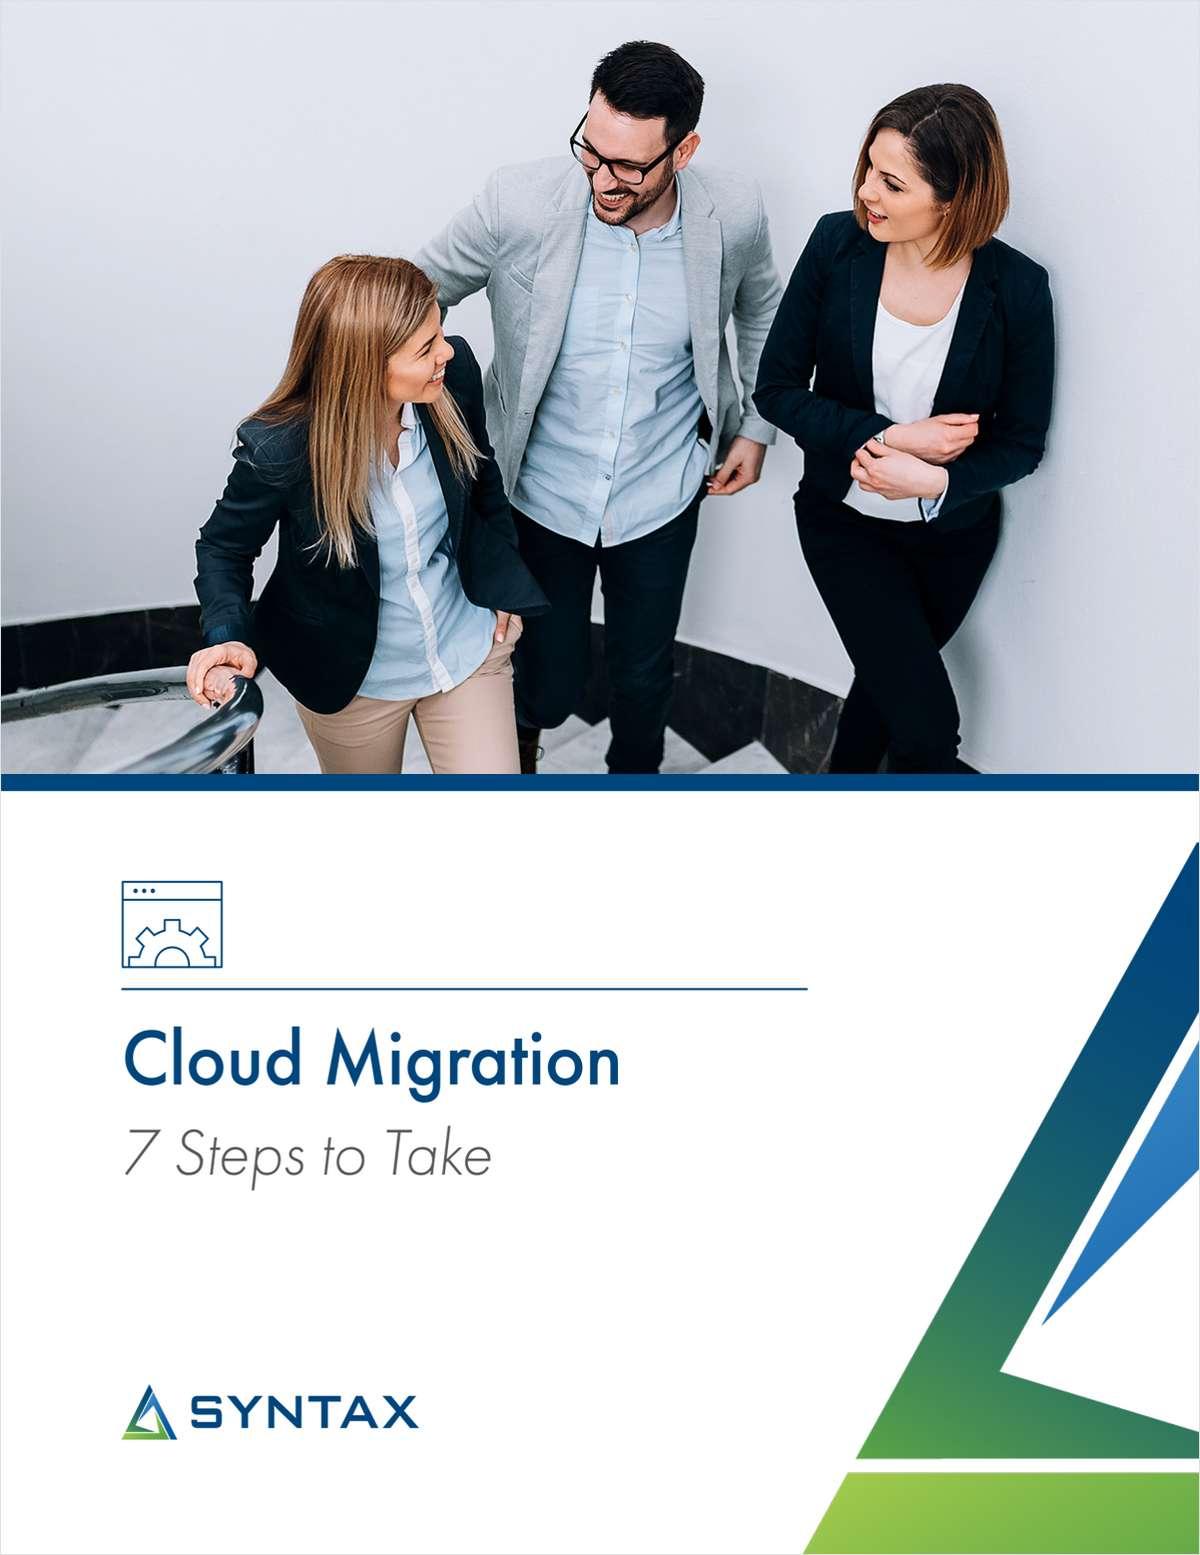 Cloud Migration: 7 Steps to Take